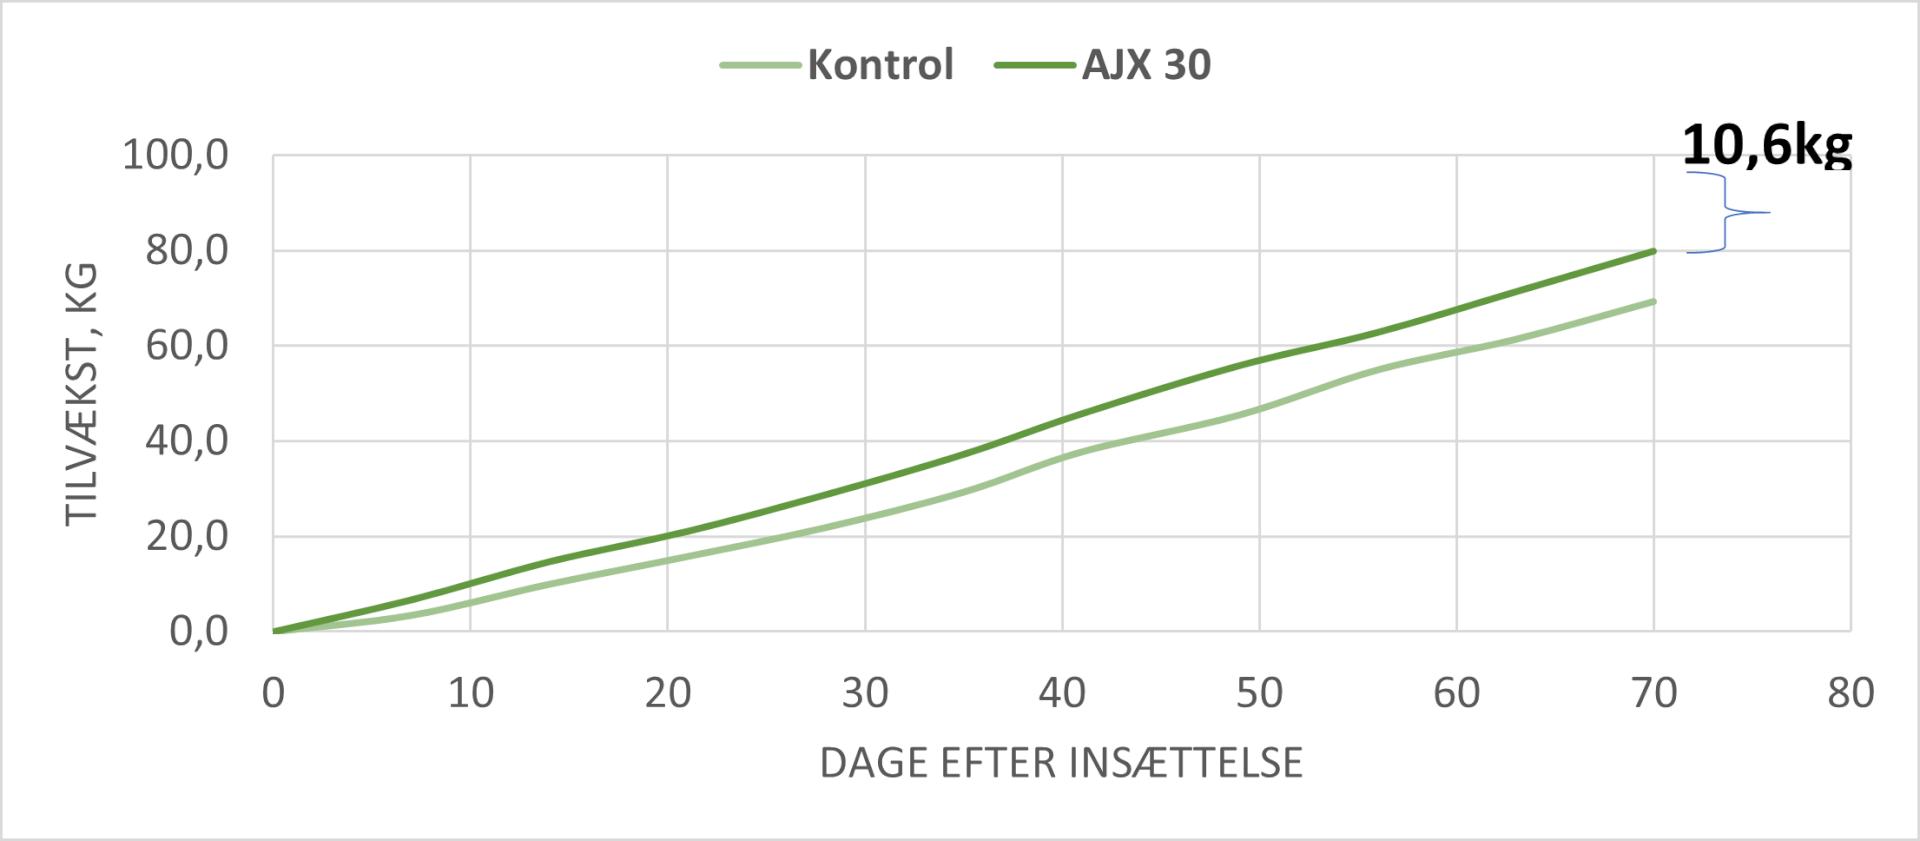 Tilvækst grise AJ X30